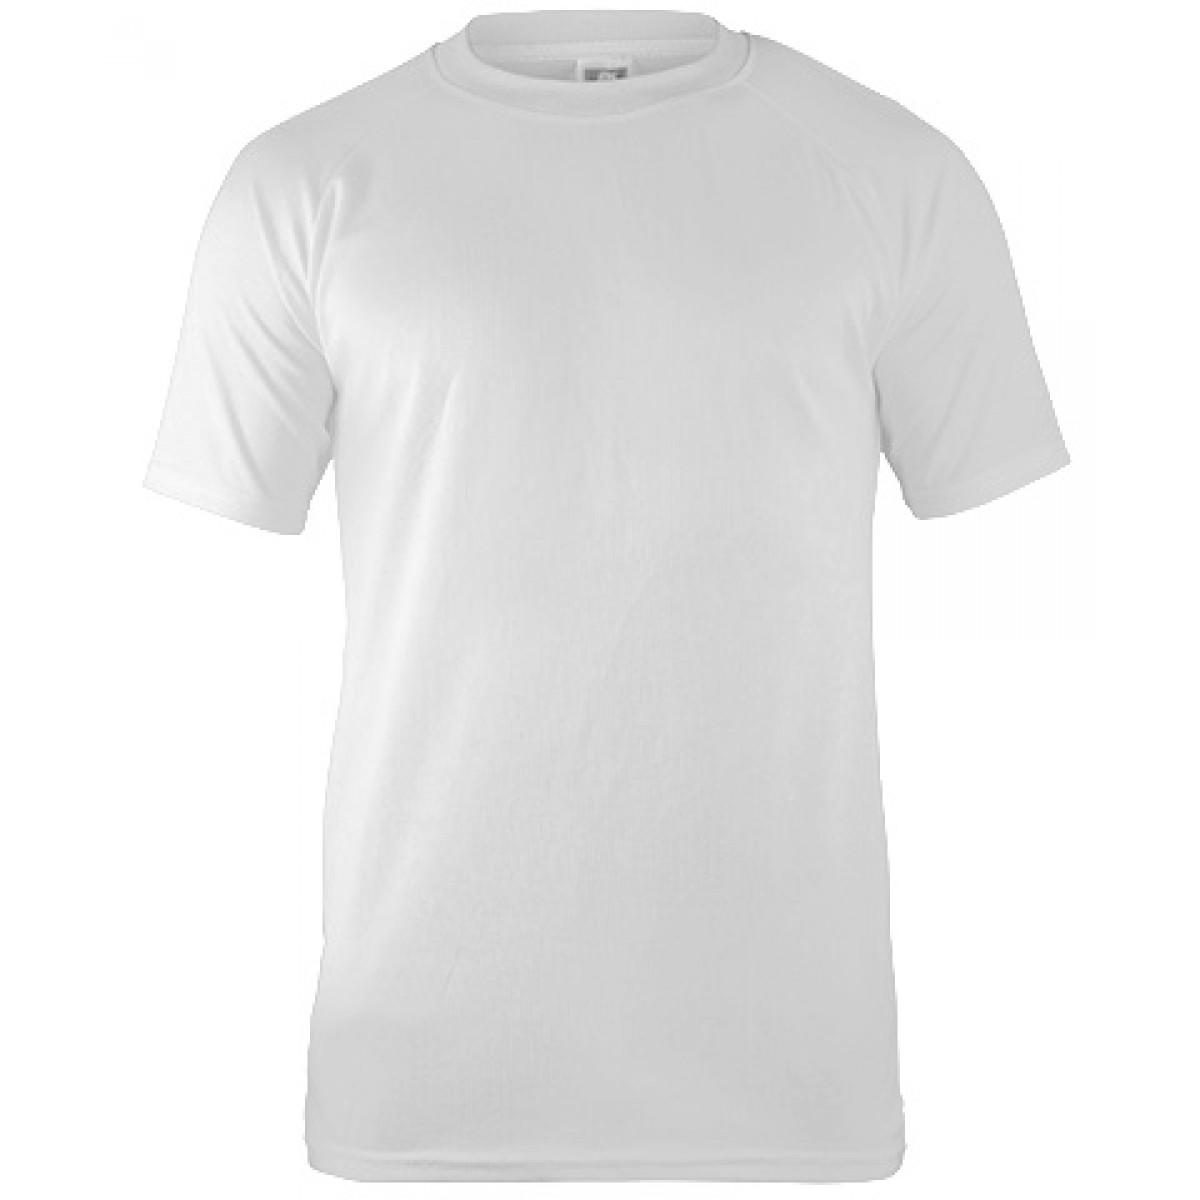 Short Sleeves Mesh Performance T-shirt-White-2XL